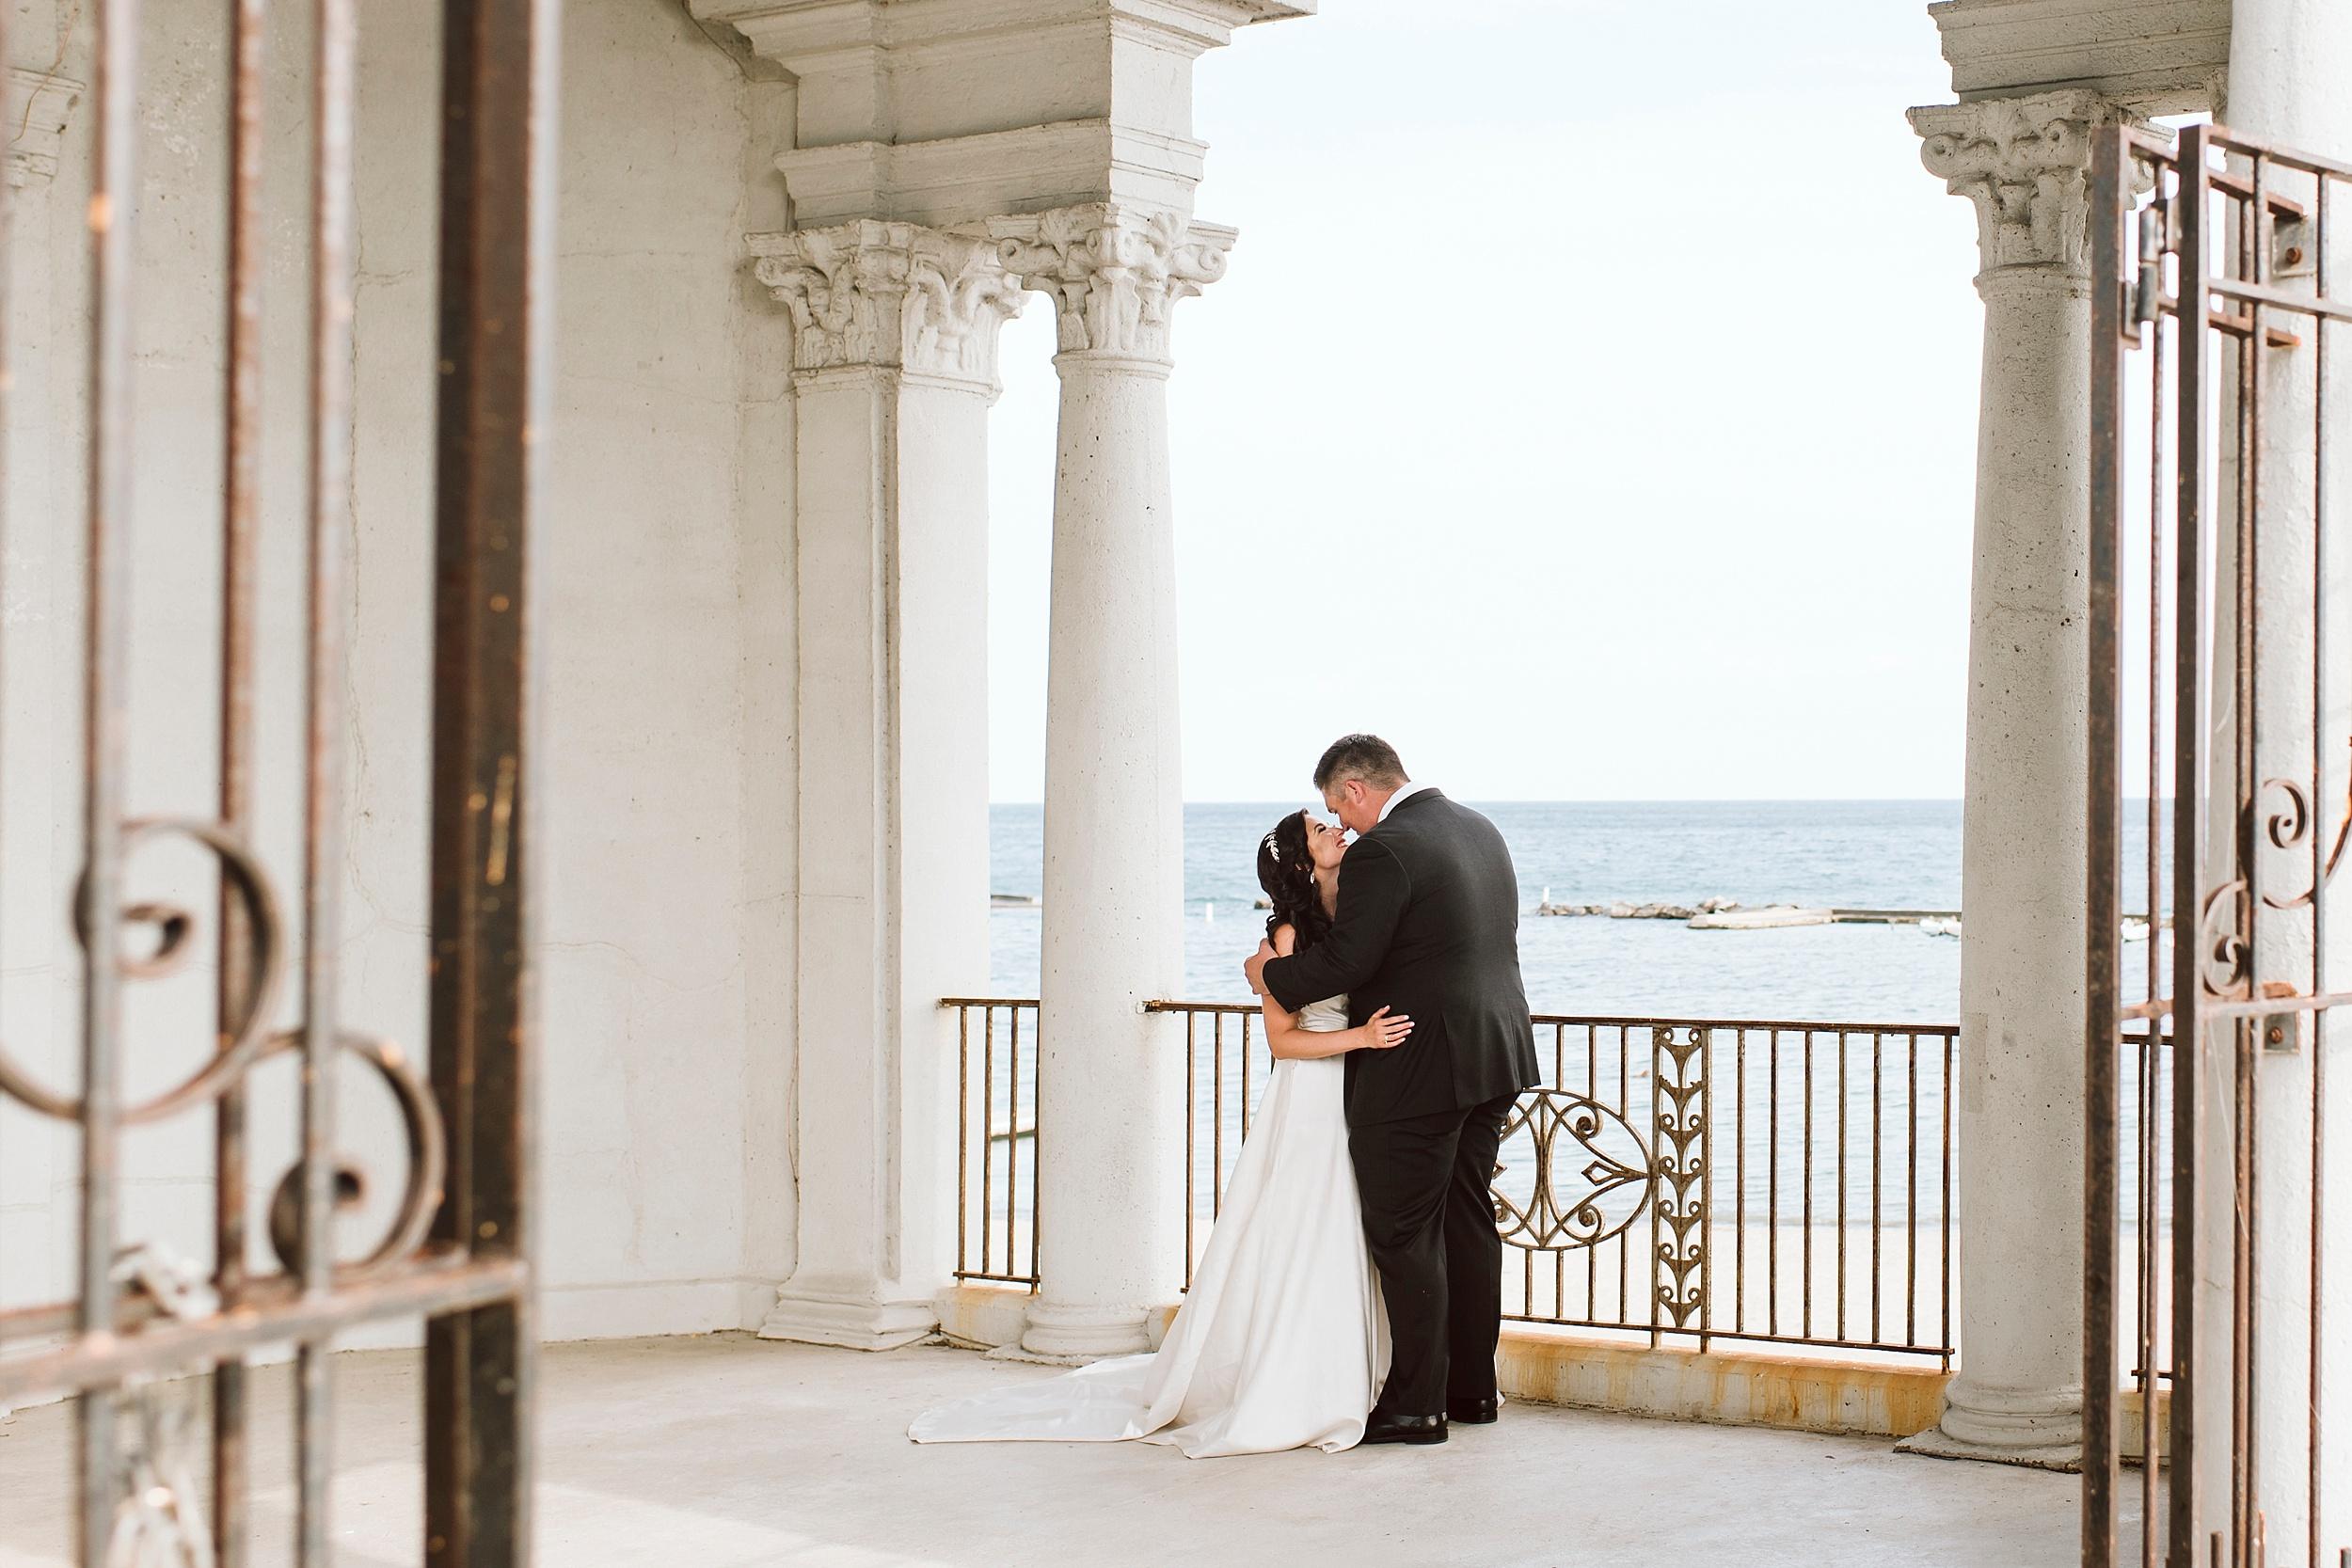 Sunnyside_Pavilion_Wedding_Toronto_Photographer_0055.jpg